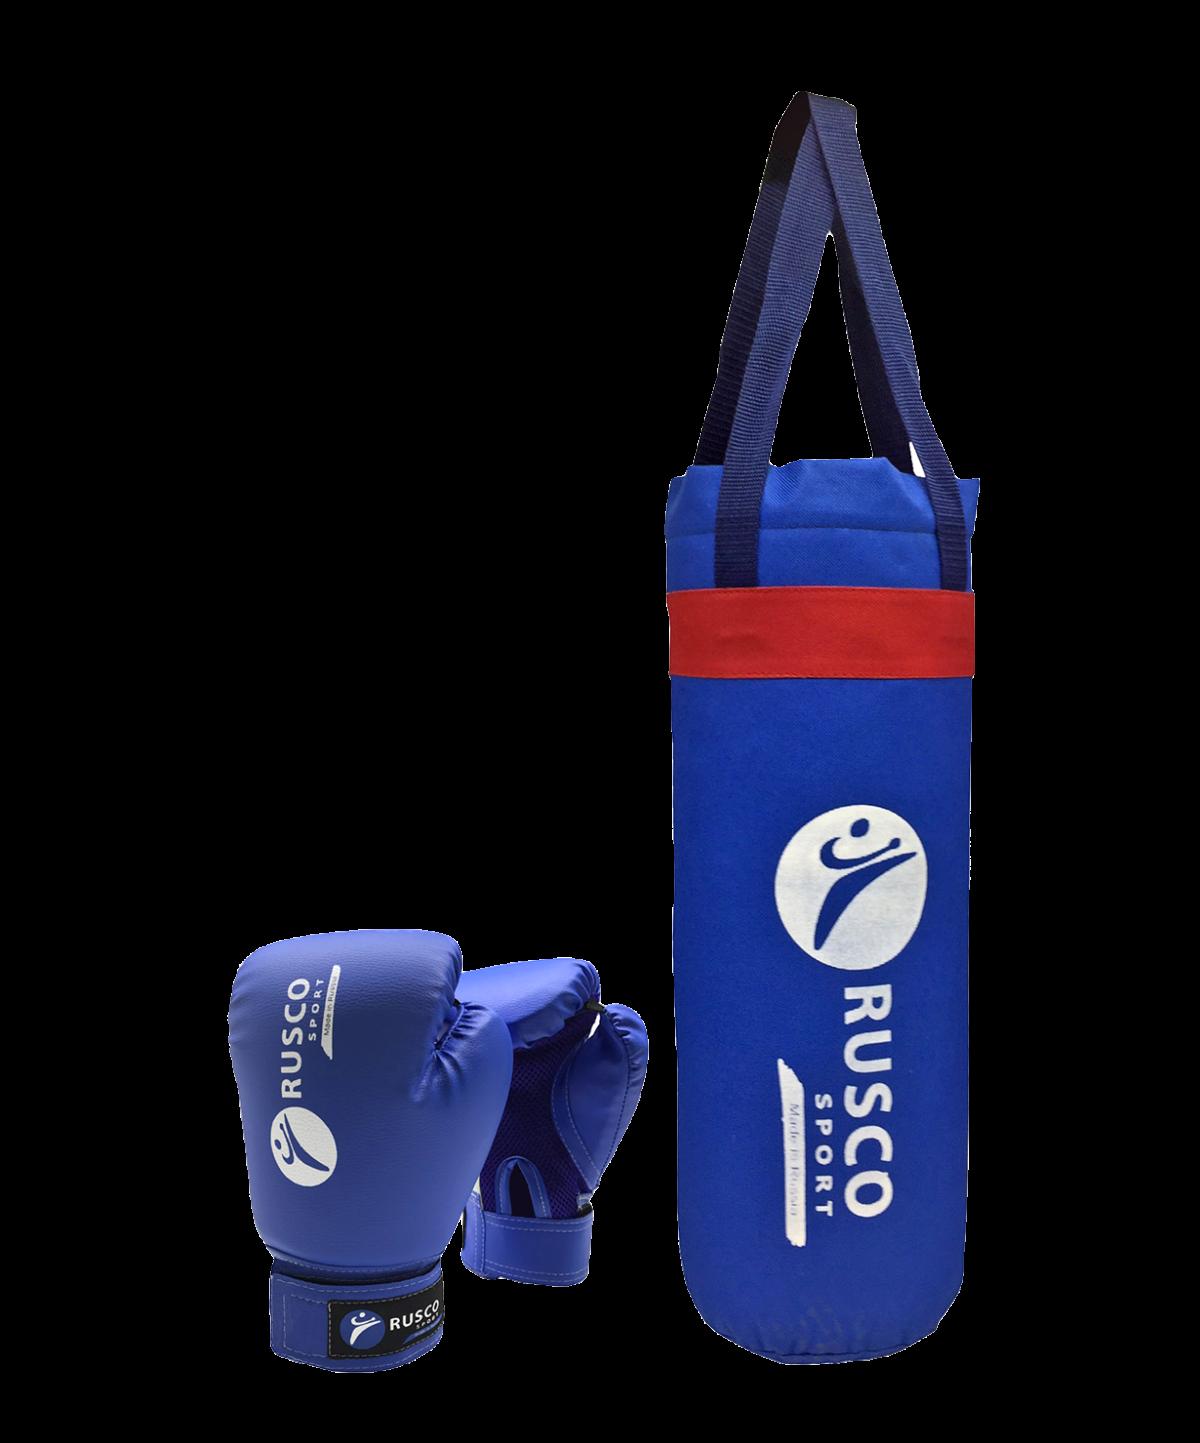 RUSCO Набор для бокса детский, 4 oz  13970 - 1